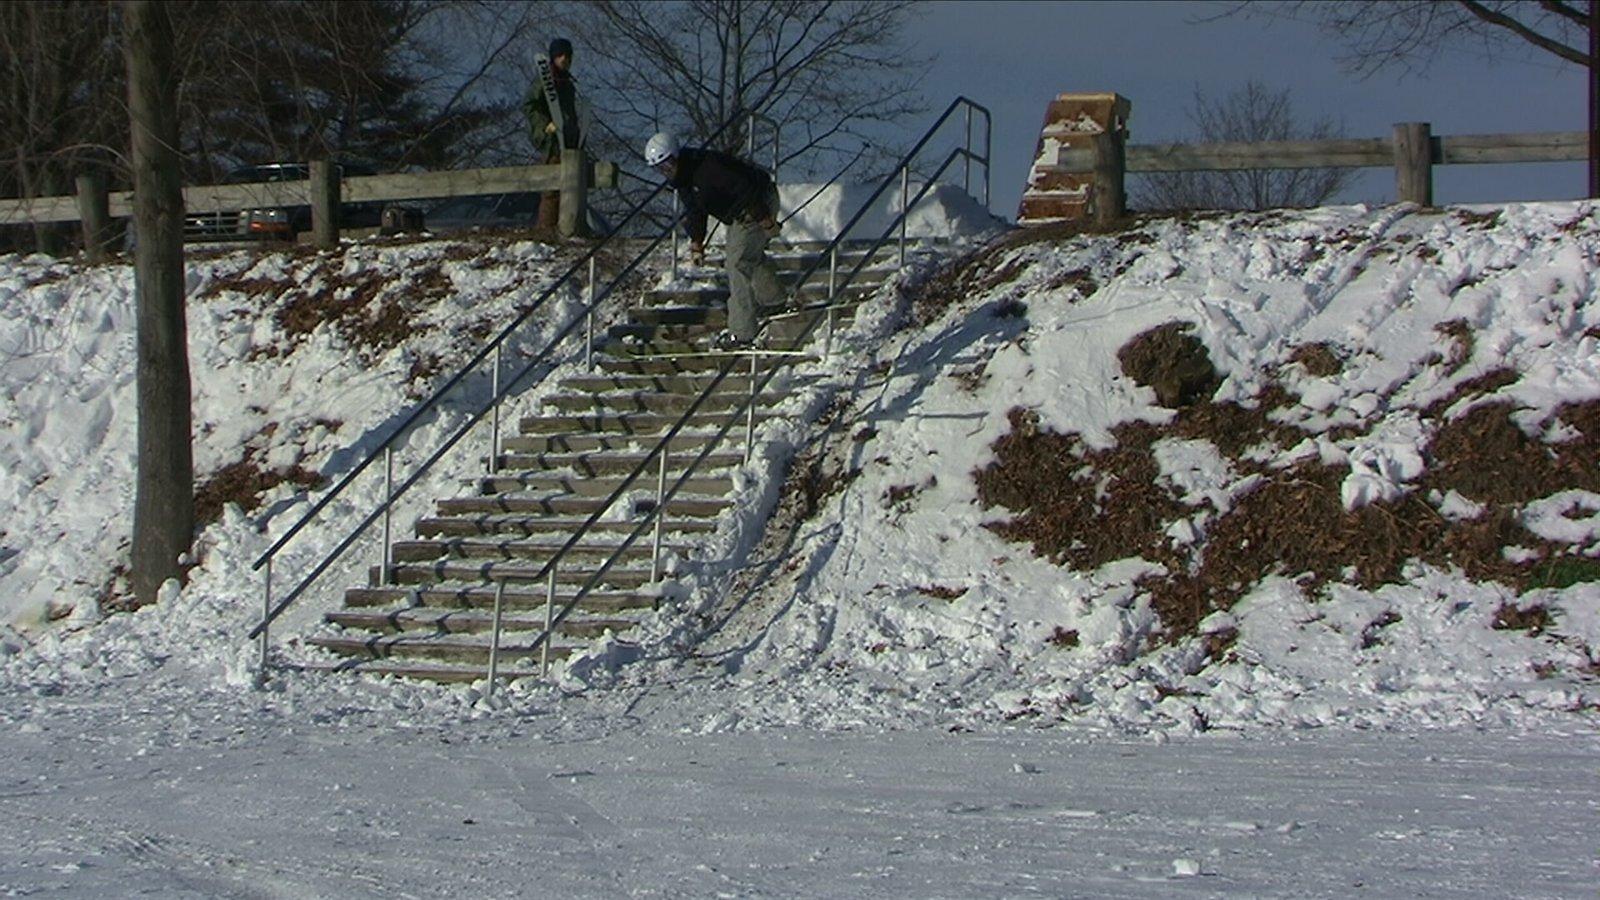 Hilton Park Lipslide